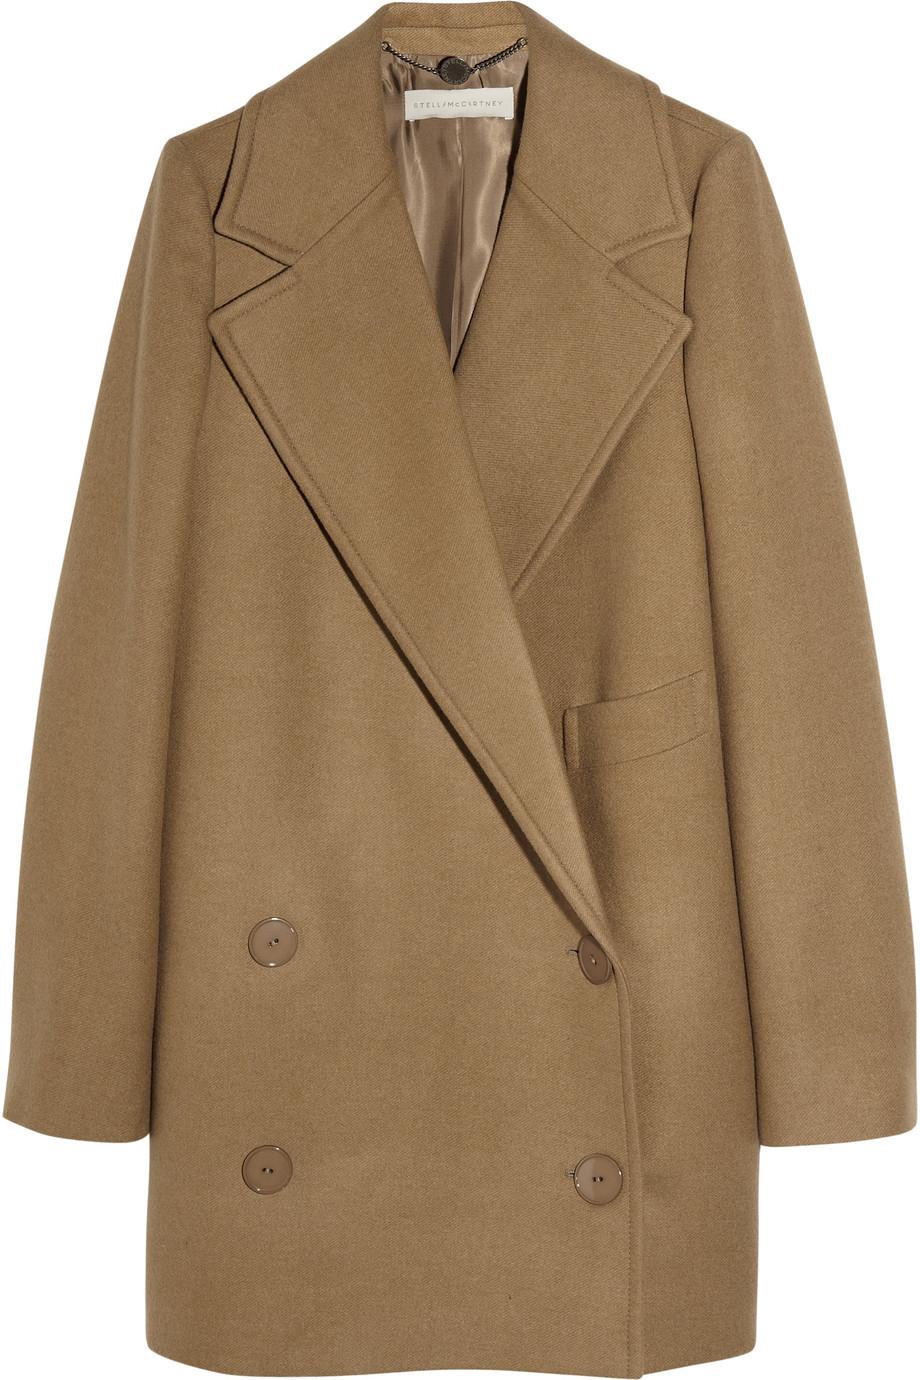 wool coat gallery vlsaqhj